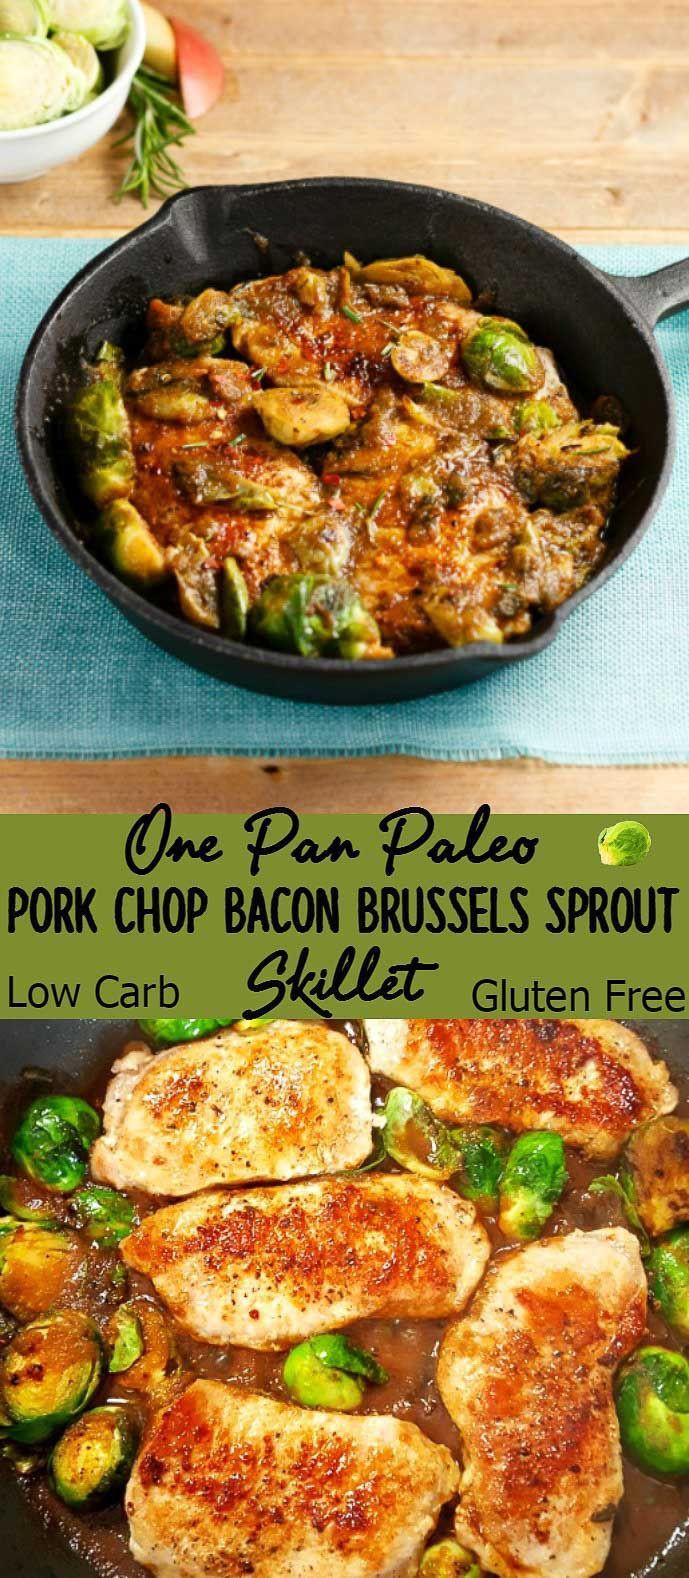 Carbs In Pork Chops  100 Pork Chop Recipes on Pinterest